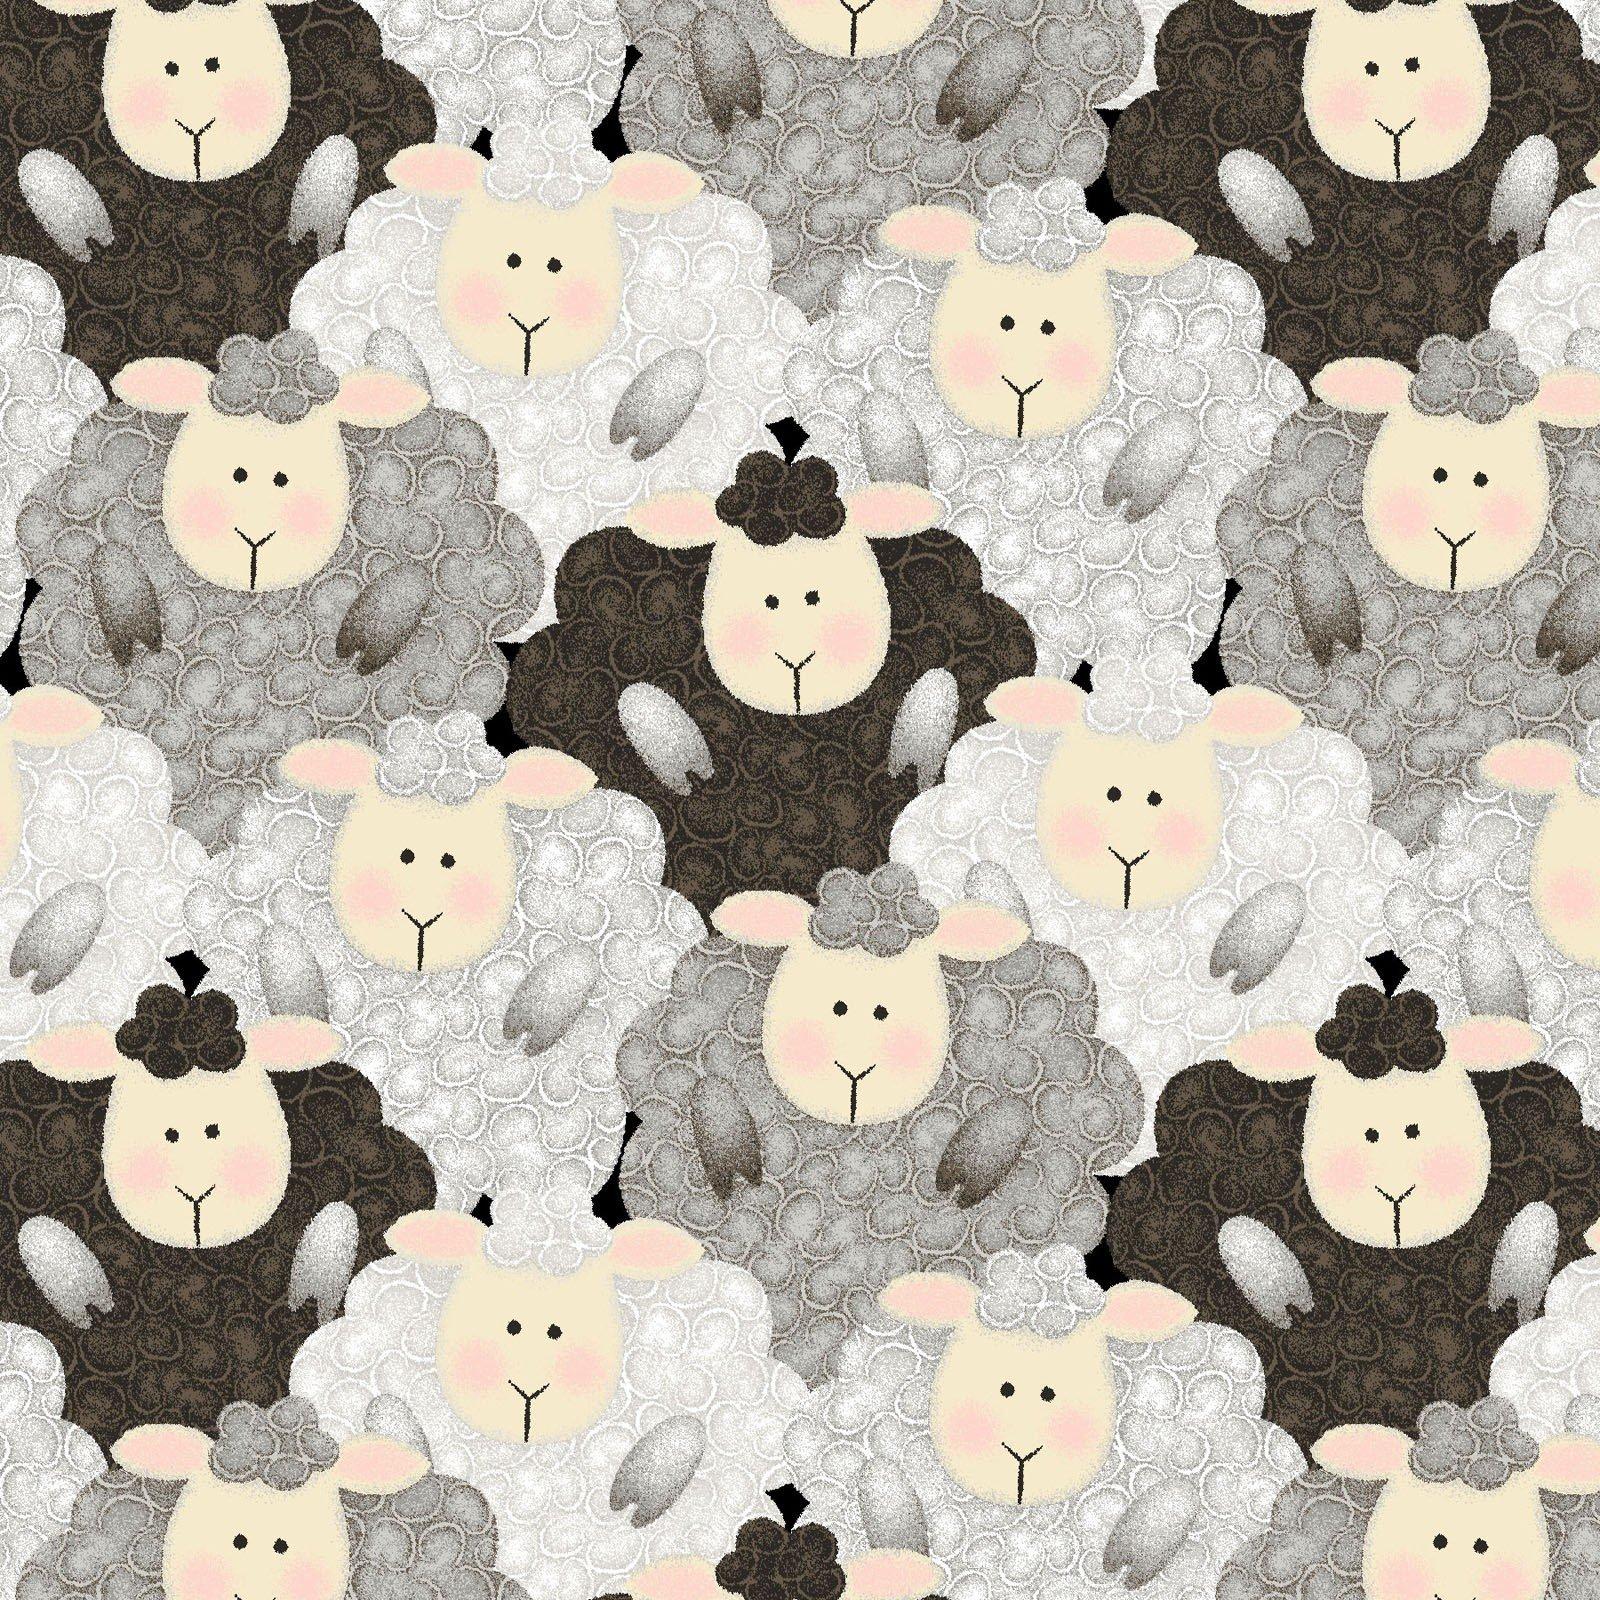 Henry Glass - Splish Splash - Sheep Pile